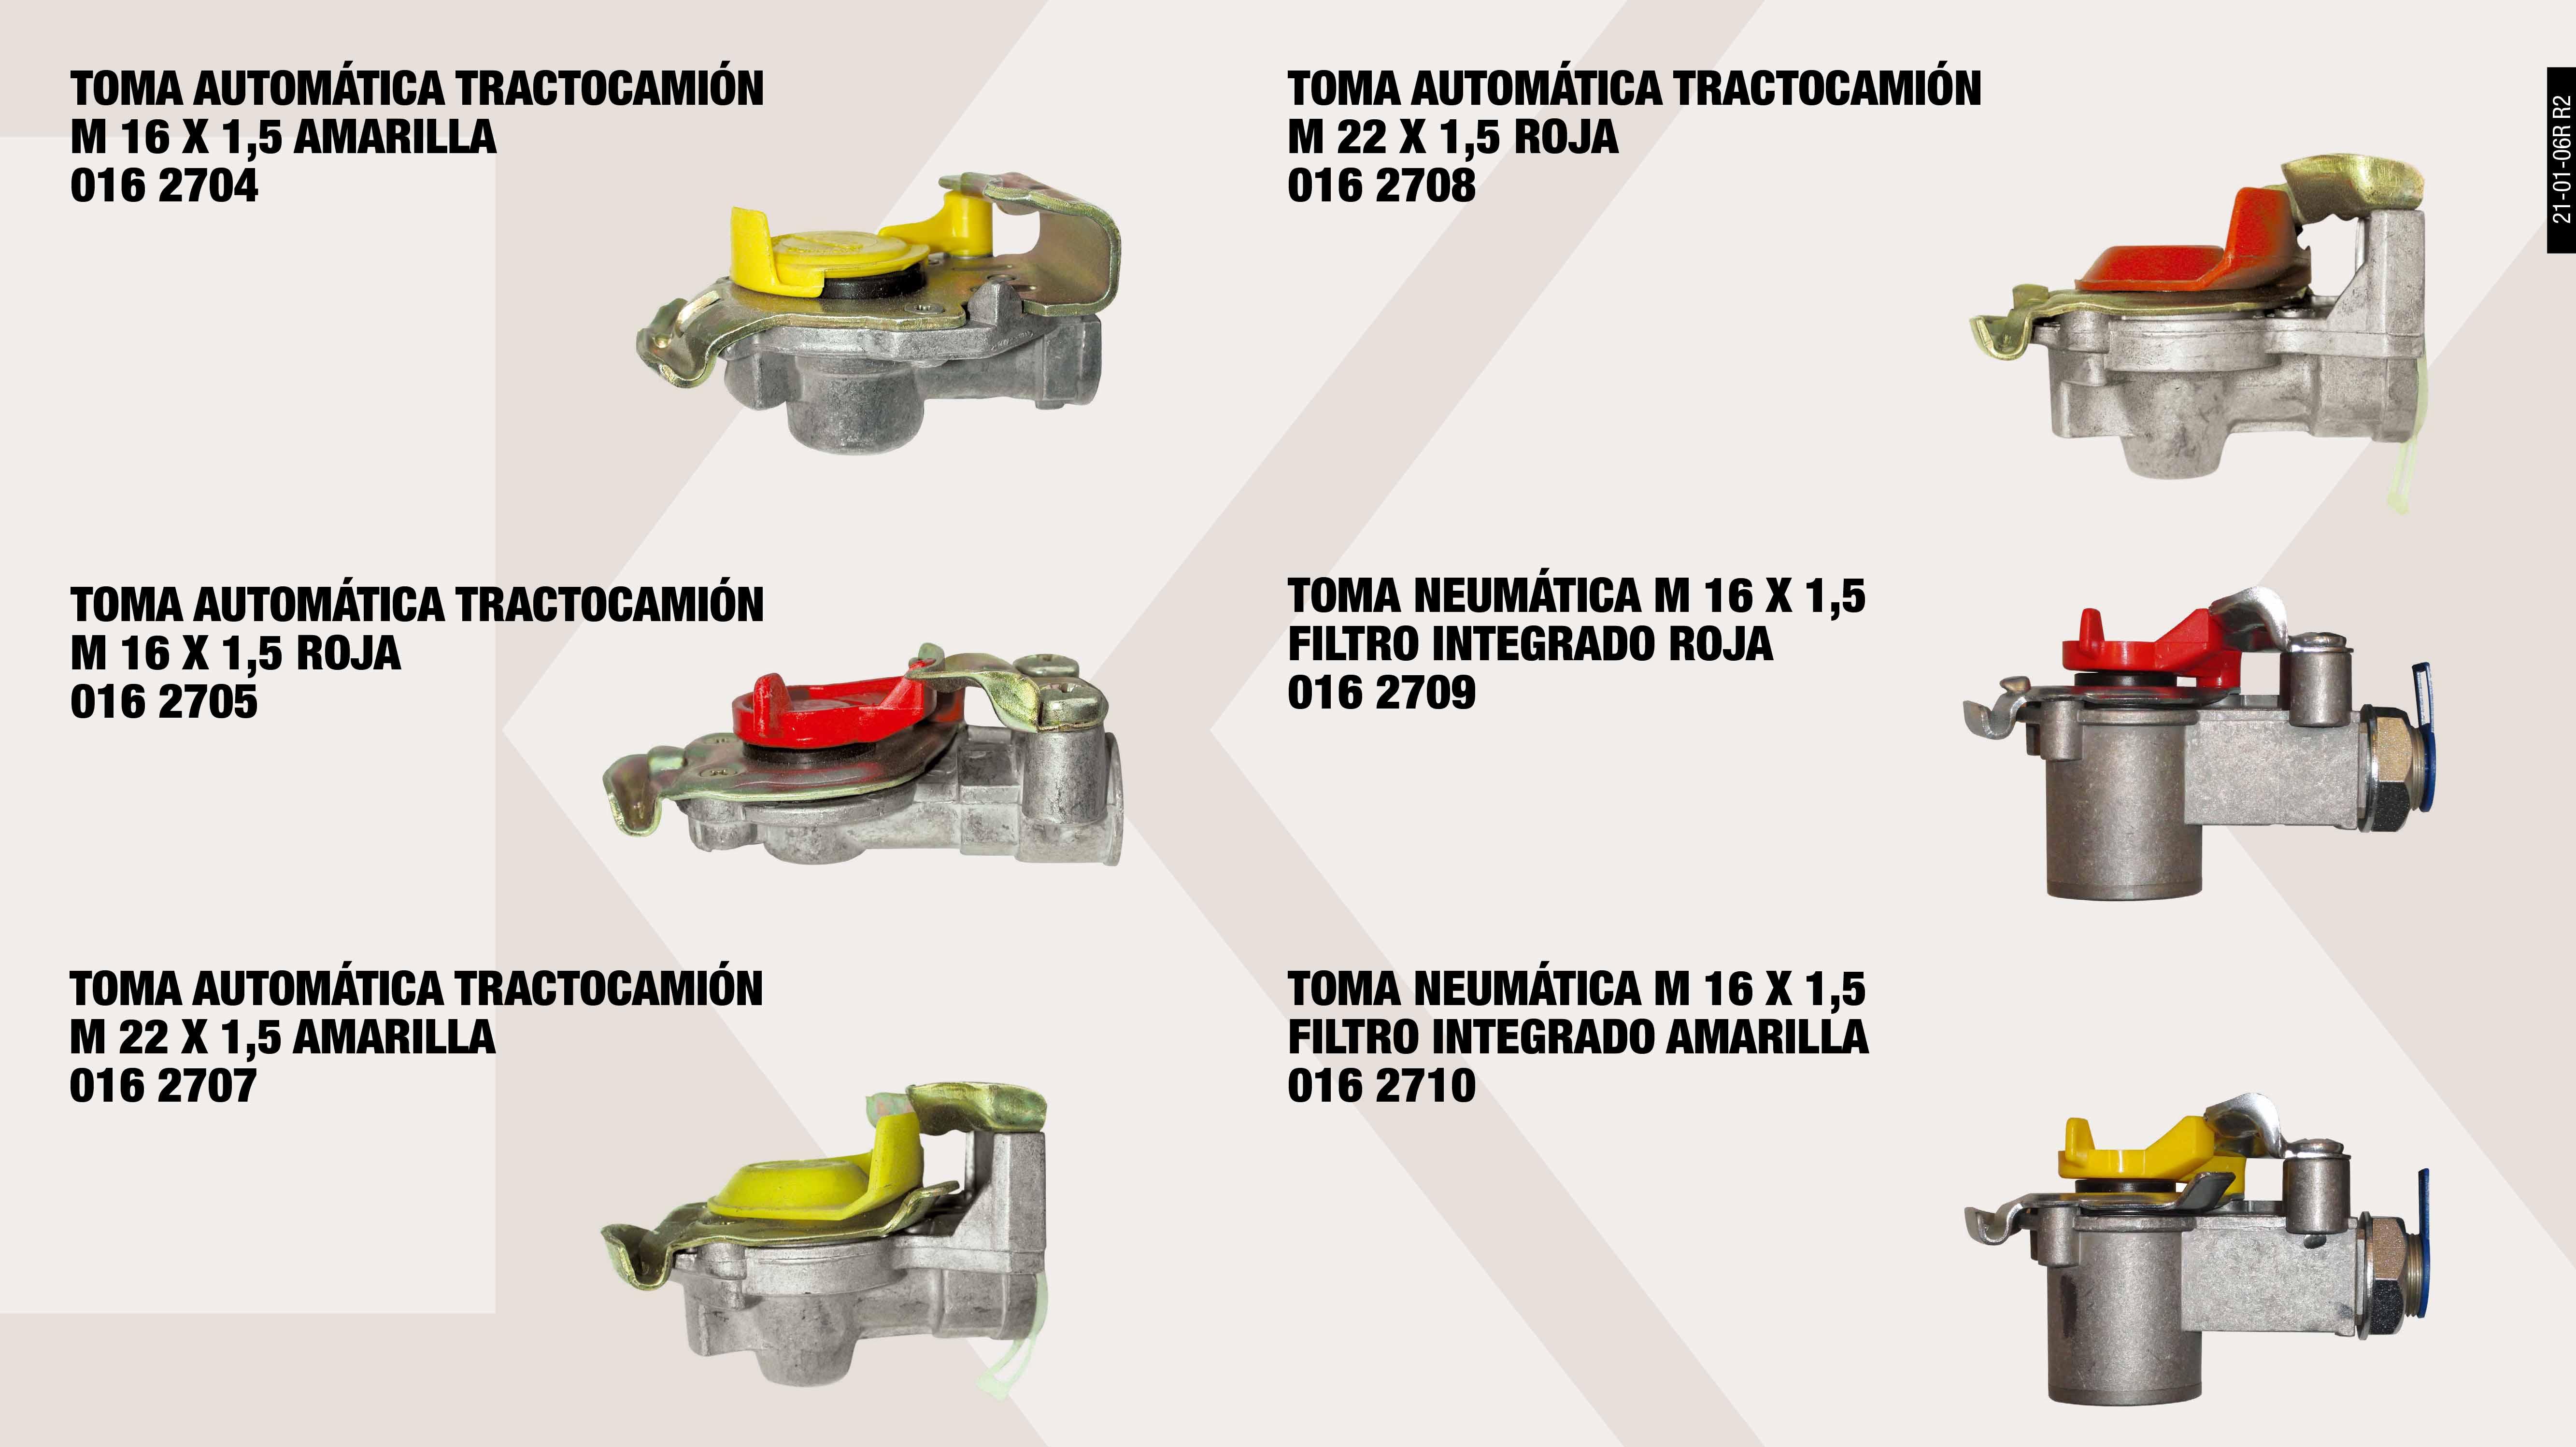 TOMA AUTOMATICA TRACTOCAMION 16X150 ROJA                    ,  TOMA AUTOMATICA TRACTOCAMION 22X150 AMA                     ,  TOMA AUTOMATICA TRACTOCAMION ESP. M16X150 ROJ               ,  TOMA AUTOMATICA TRACTOCAMION 16X150 AM.                     ,  TOMA NEUMATICA M16X1.5 FILTRO INTEGRADO ROJA                ,  TOMA AUTOMATICA TRACTOCAMION 22X150 ROJA                    ,  TOMA NEUMATICA M16X1.5 FILTRO INTEGRADO AMARILLA            ,